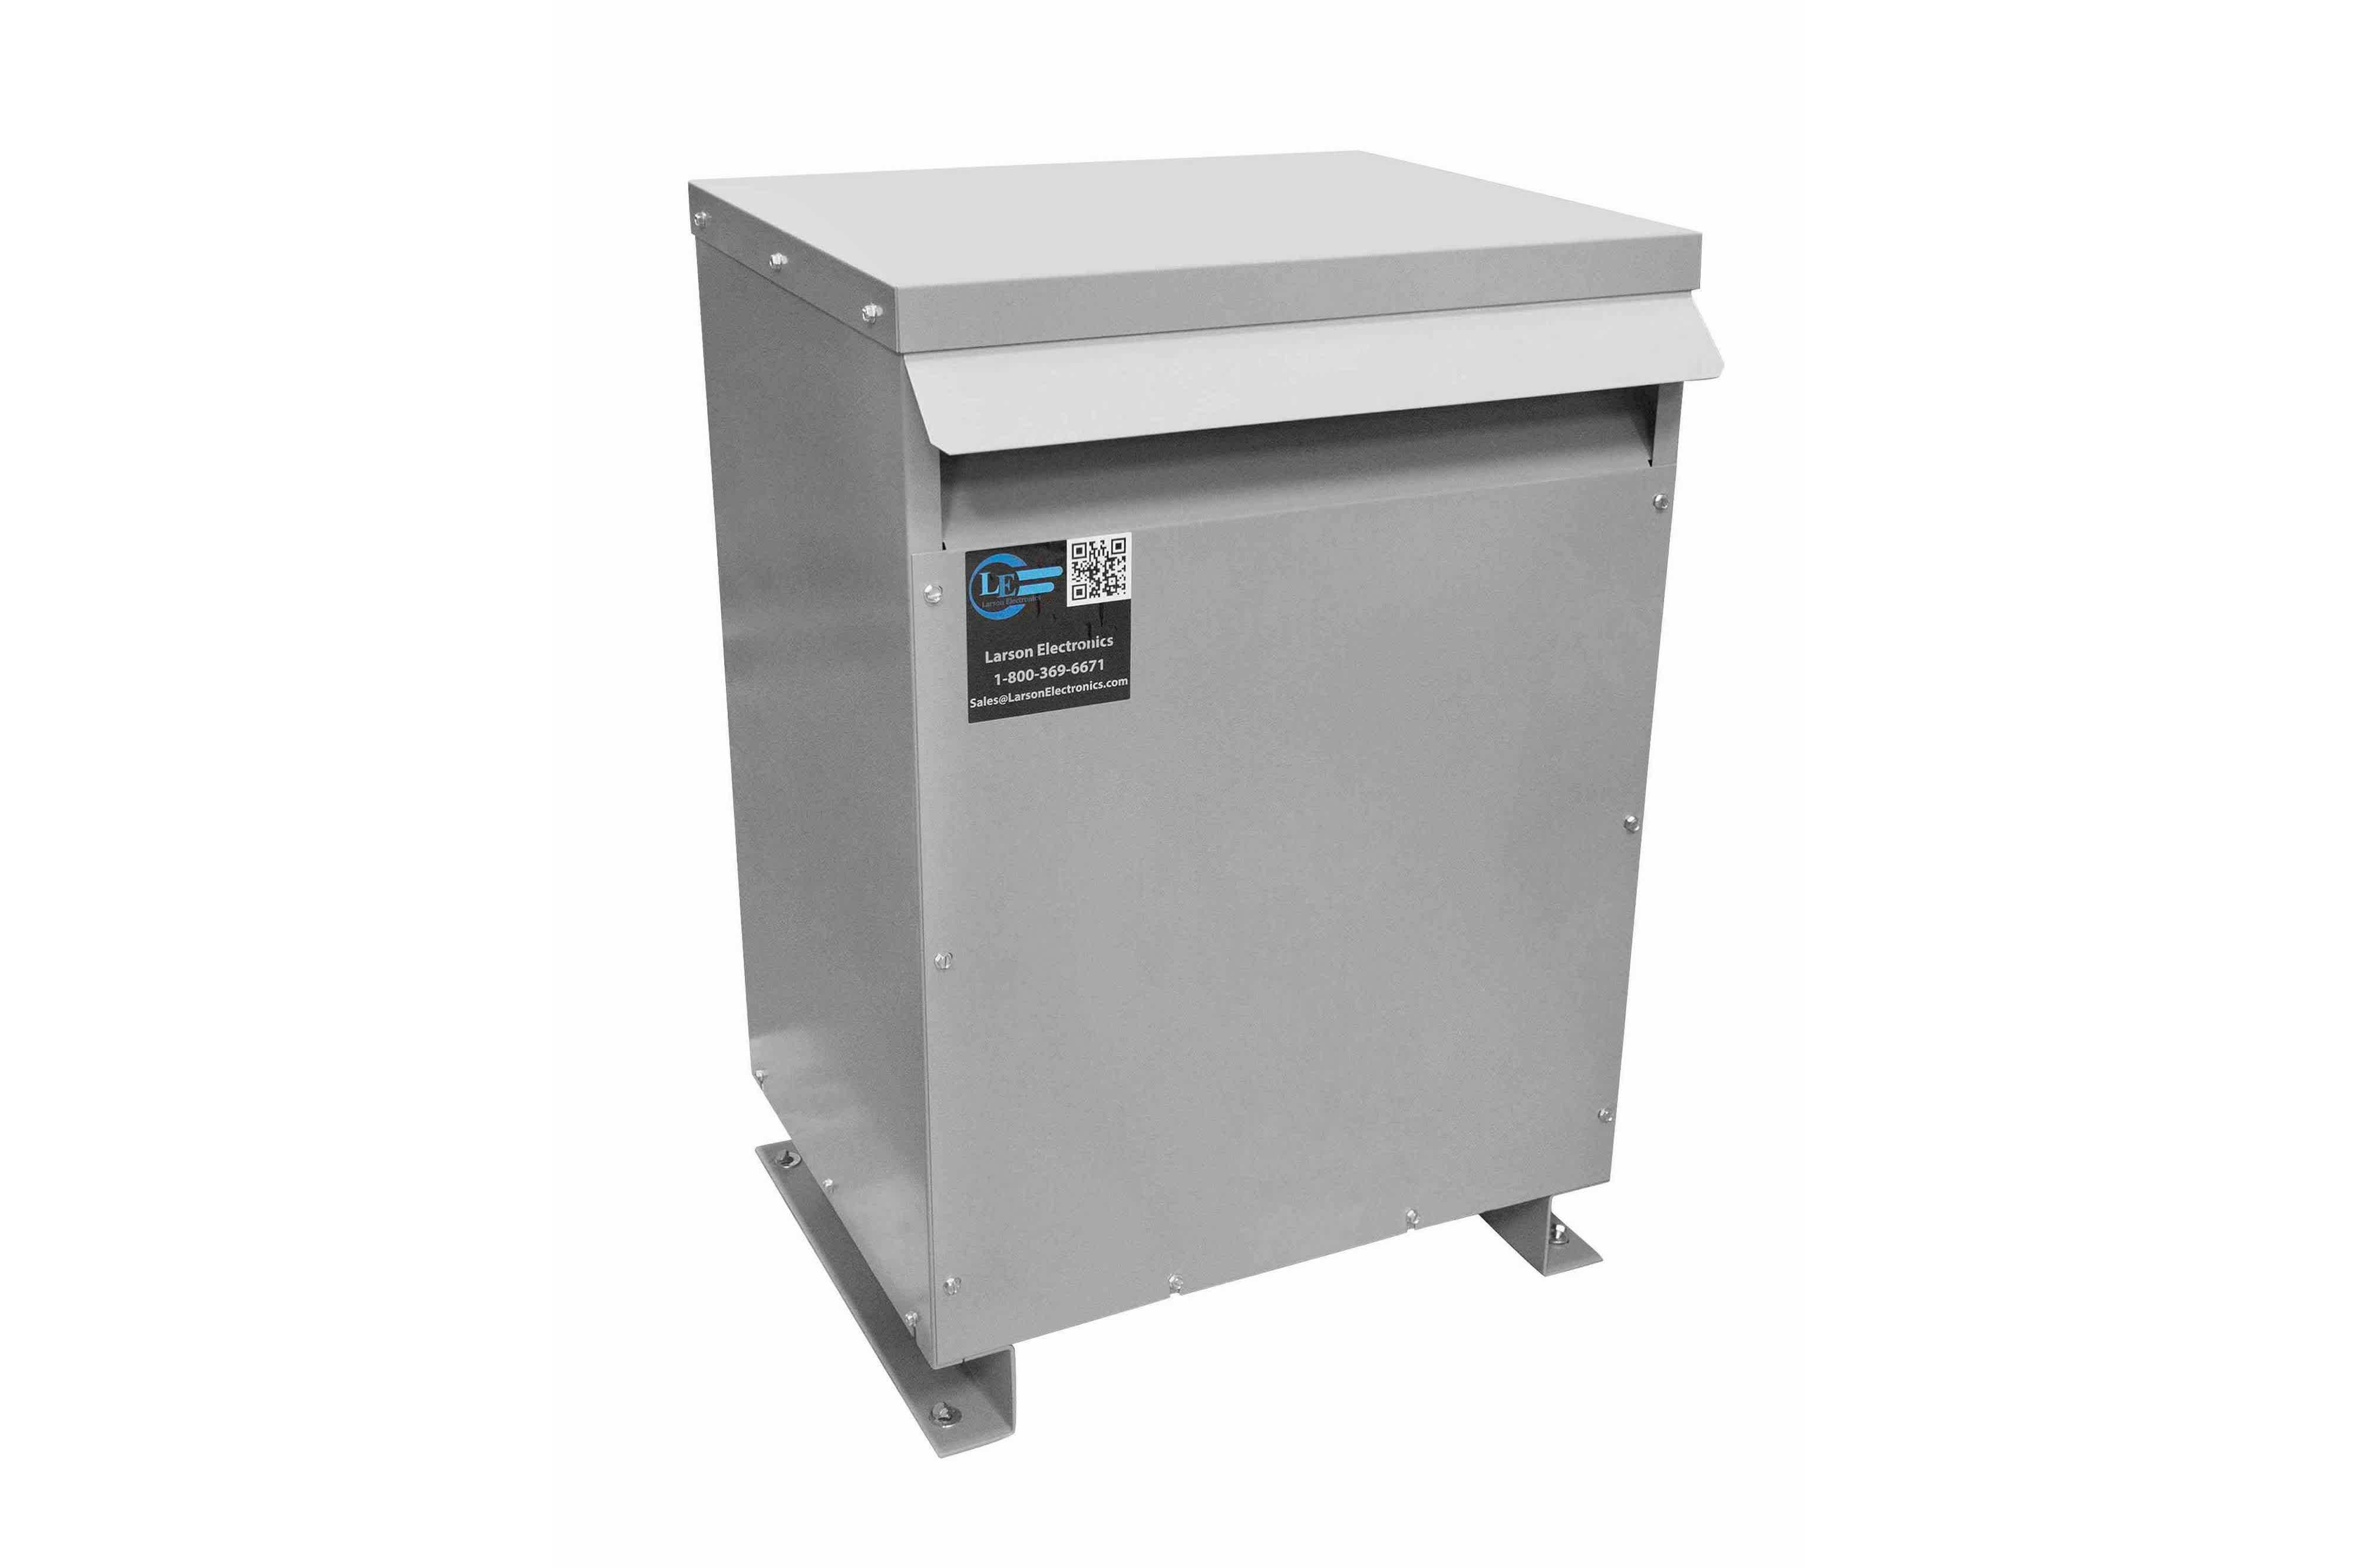 100 kVA 3PH Isolation Transformer, 380V Wye Primary, 600Y/347 Wye-N Secondary, N3R, Ventilated, 60 Hz